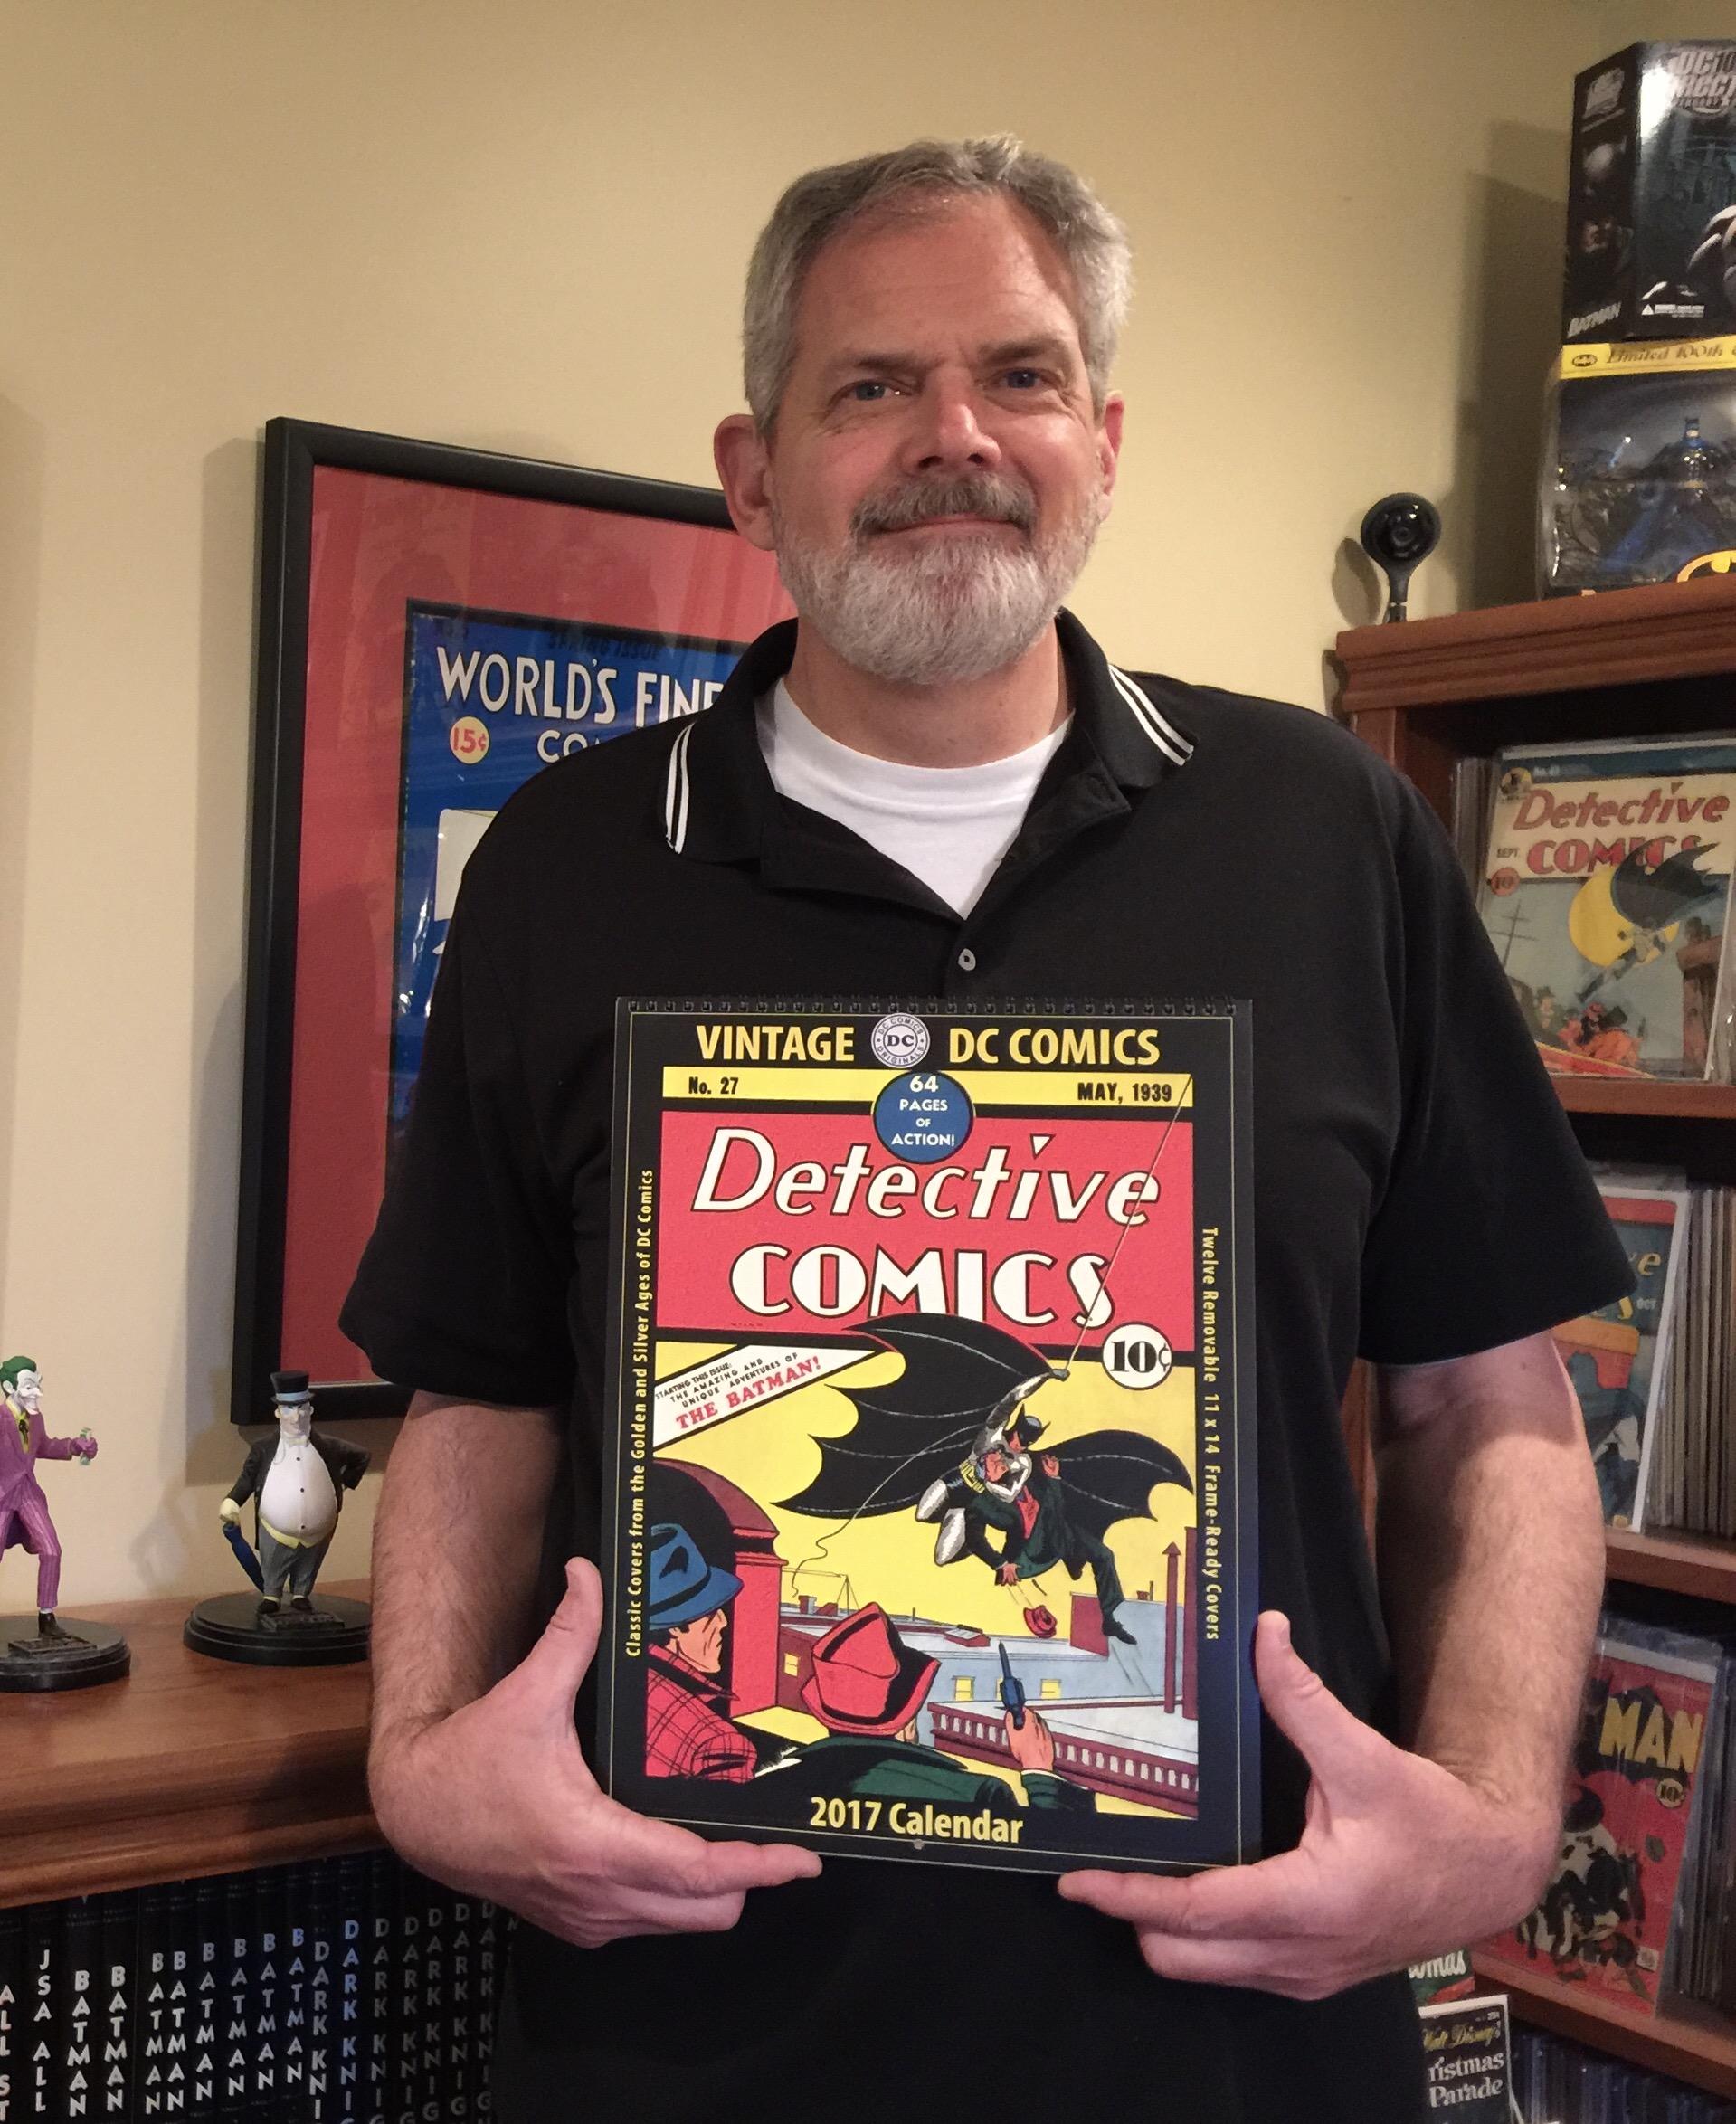 The Asgard Press Captain of Commentary, Bill Jourdain – SALUTE!